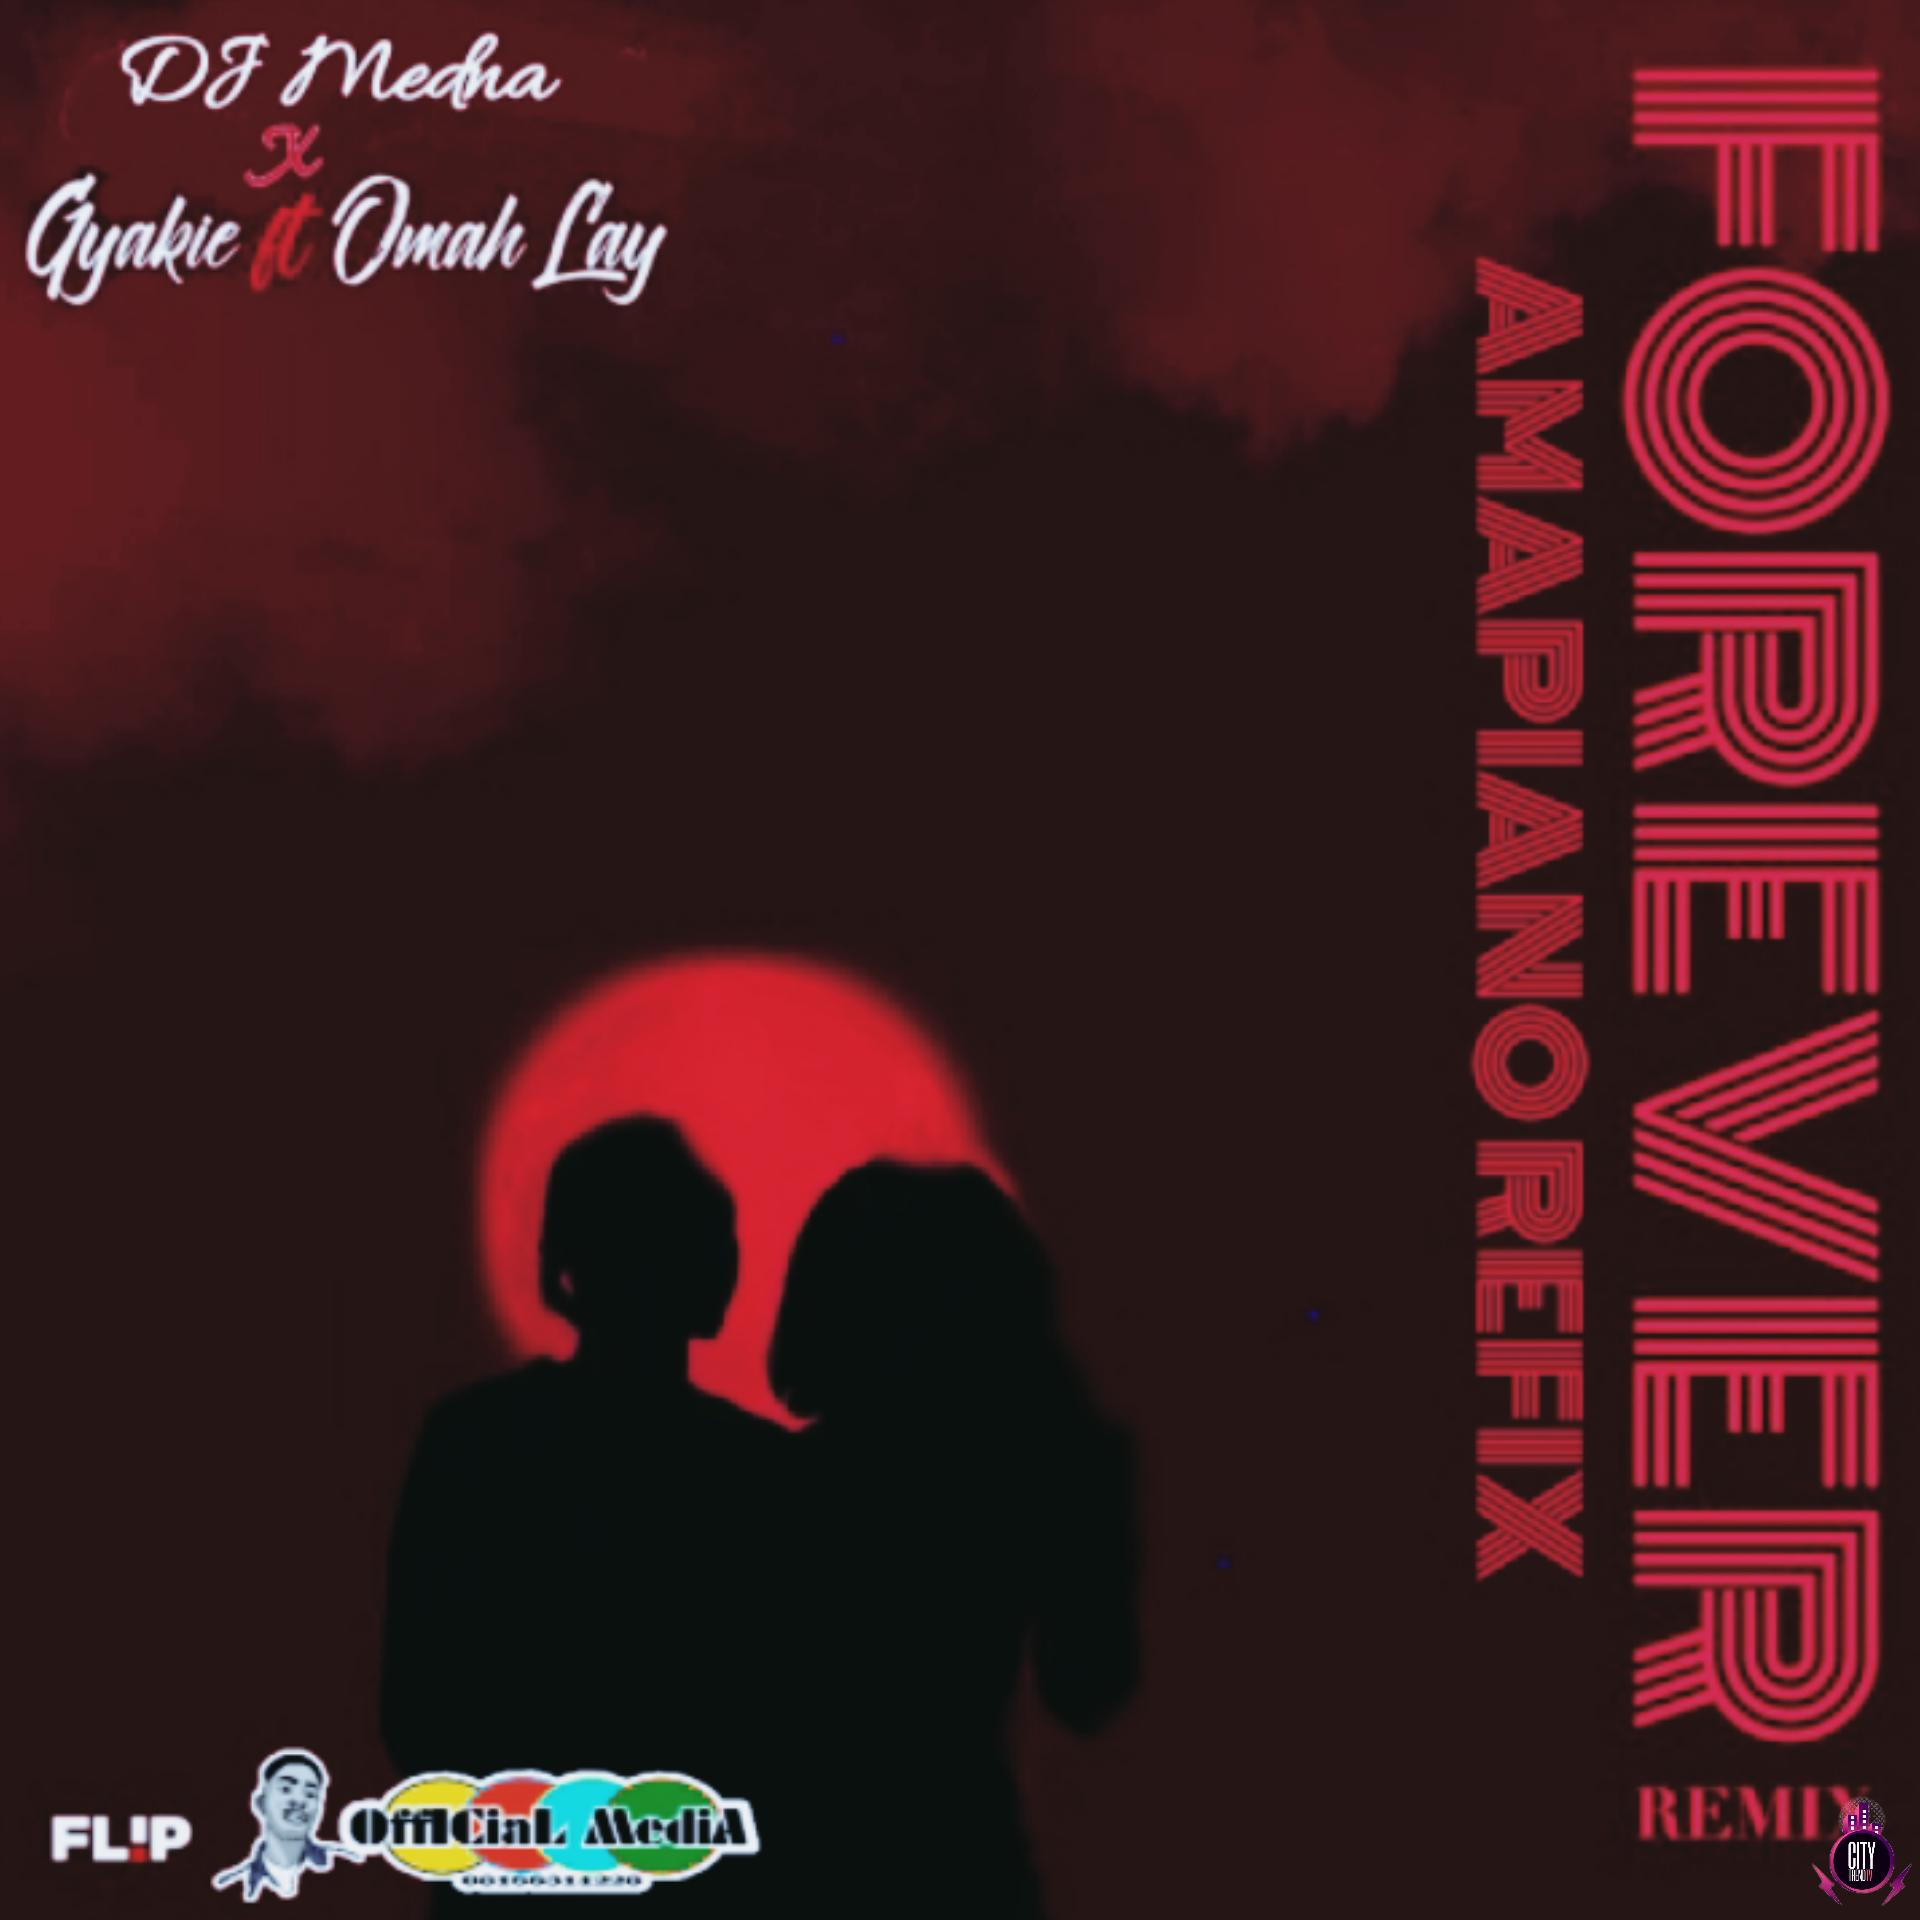 DJ Medna x Gyakie ft. Omah Lay – Forever Amapiano Refix